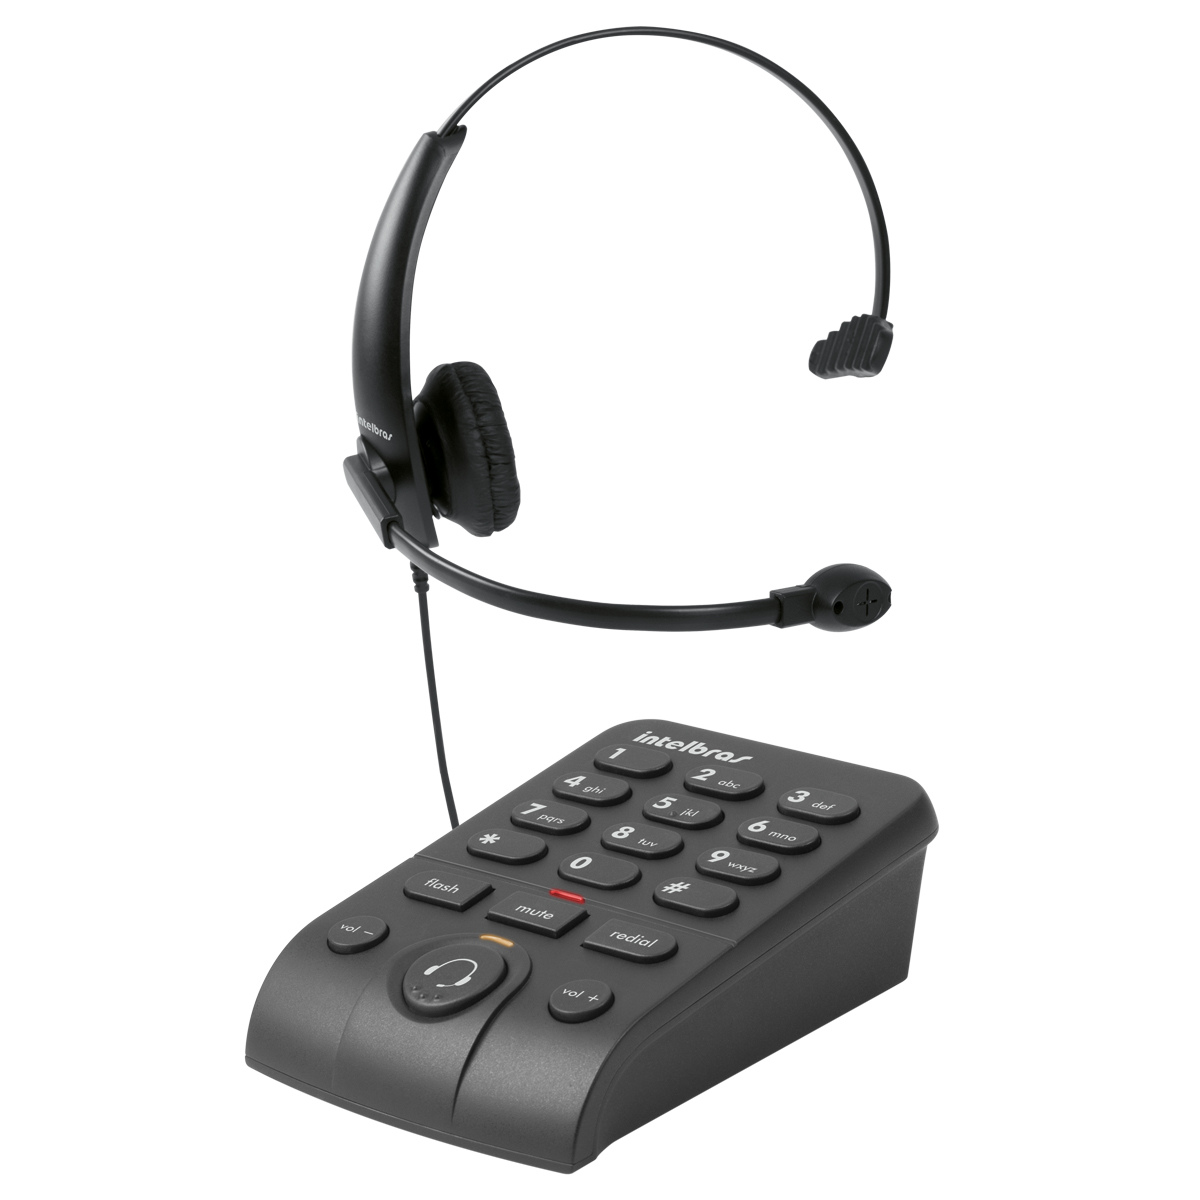 Telefone Headset com Teclado Intelbras Hsb 50